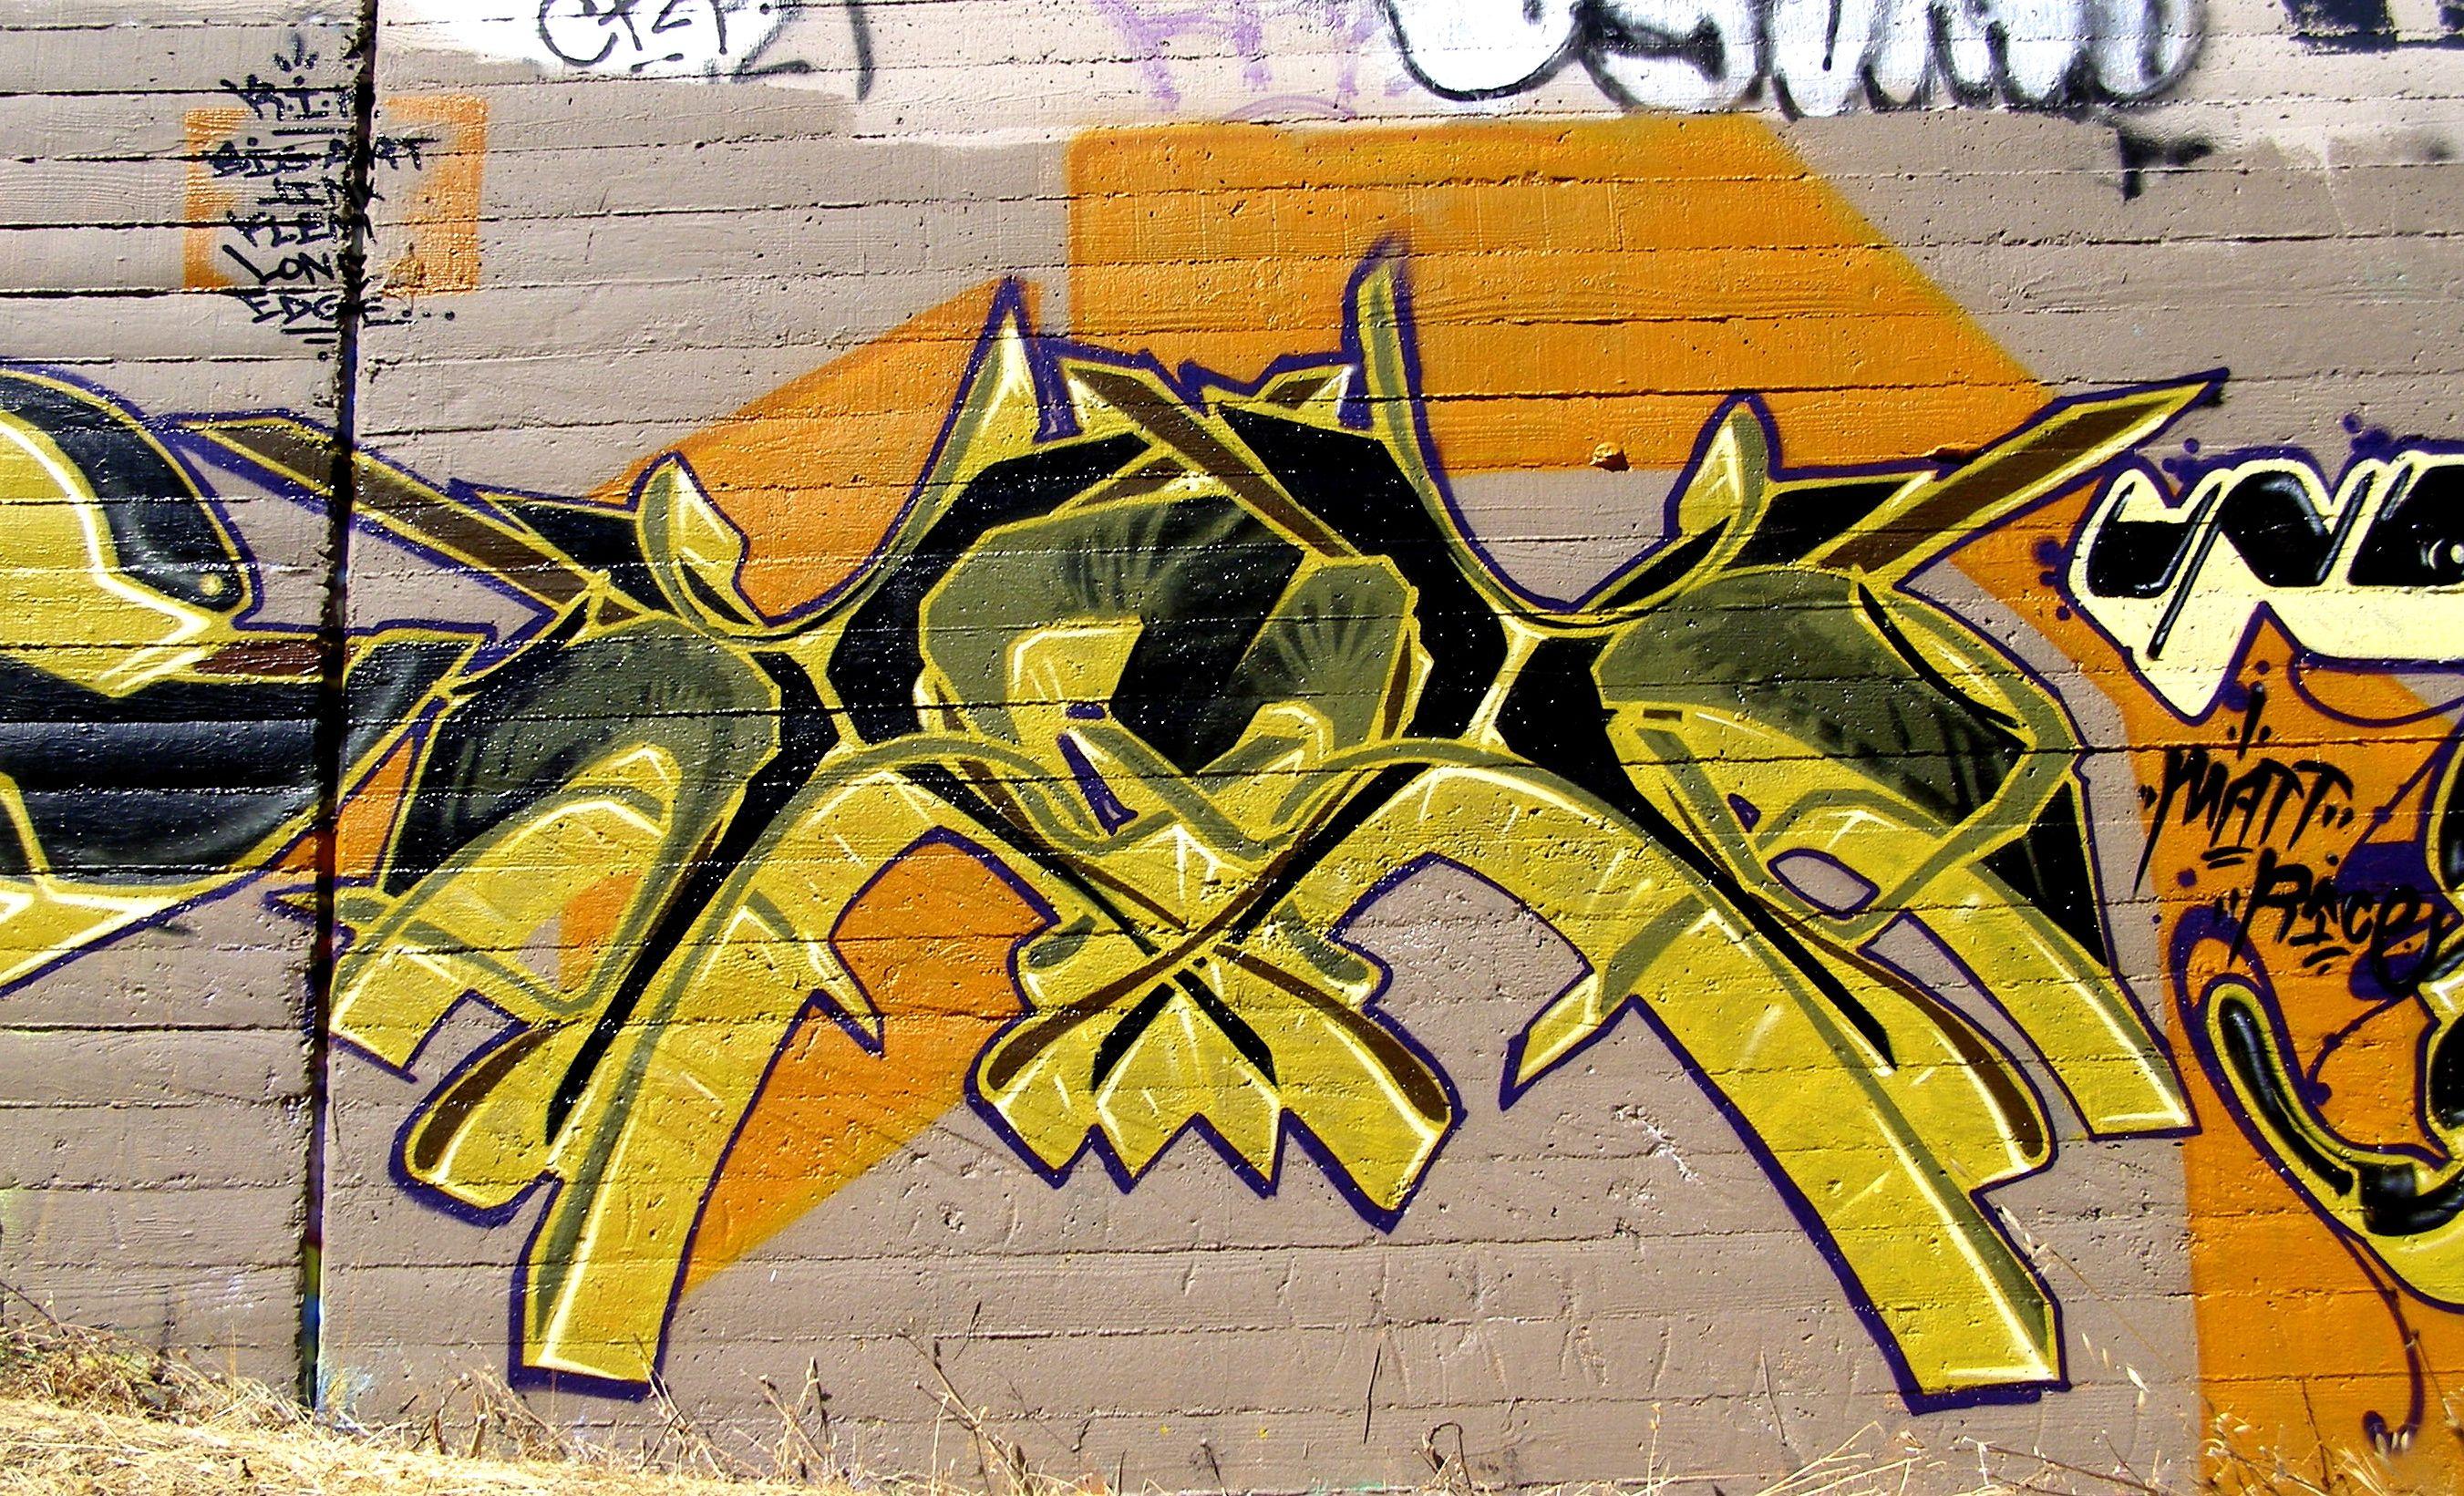 wildstyle-graffiti - Google Search | Interest | Pinterest ...